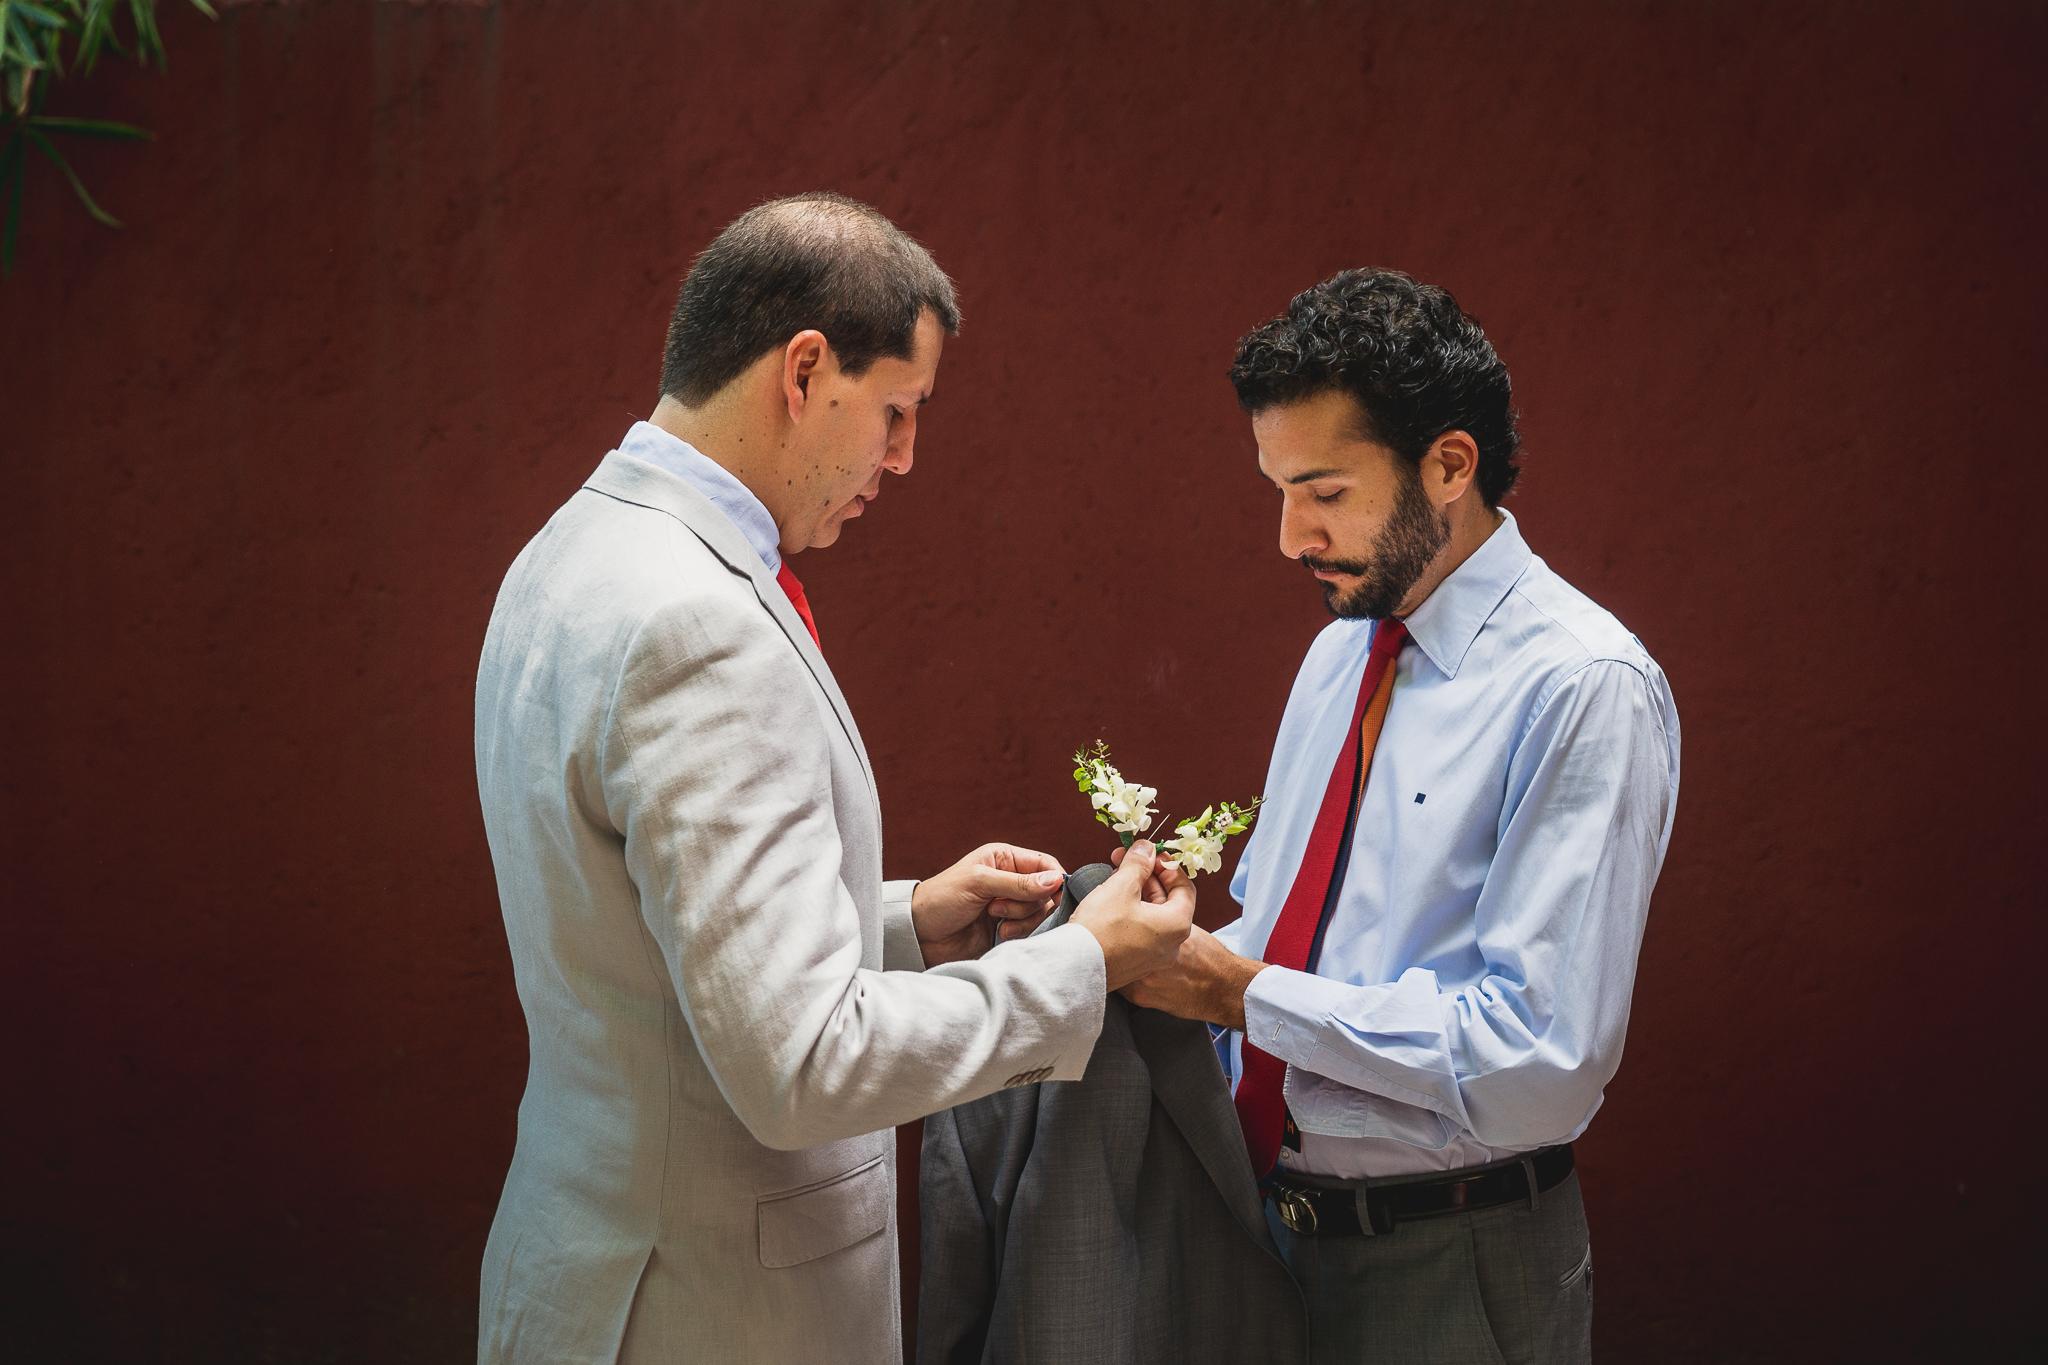 wedding-photography-mexico-quinta-rubelinas-22.jpg